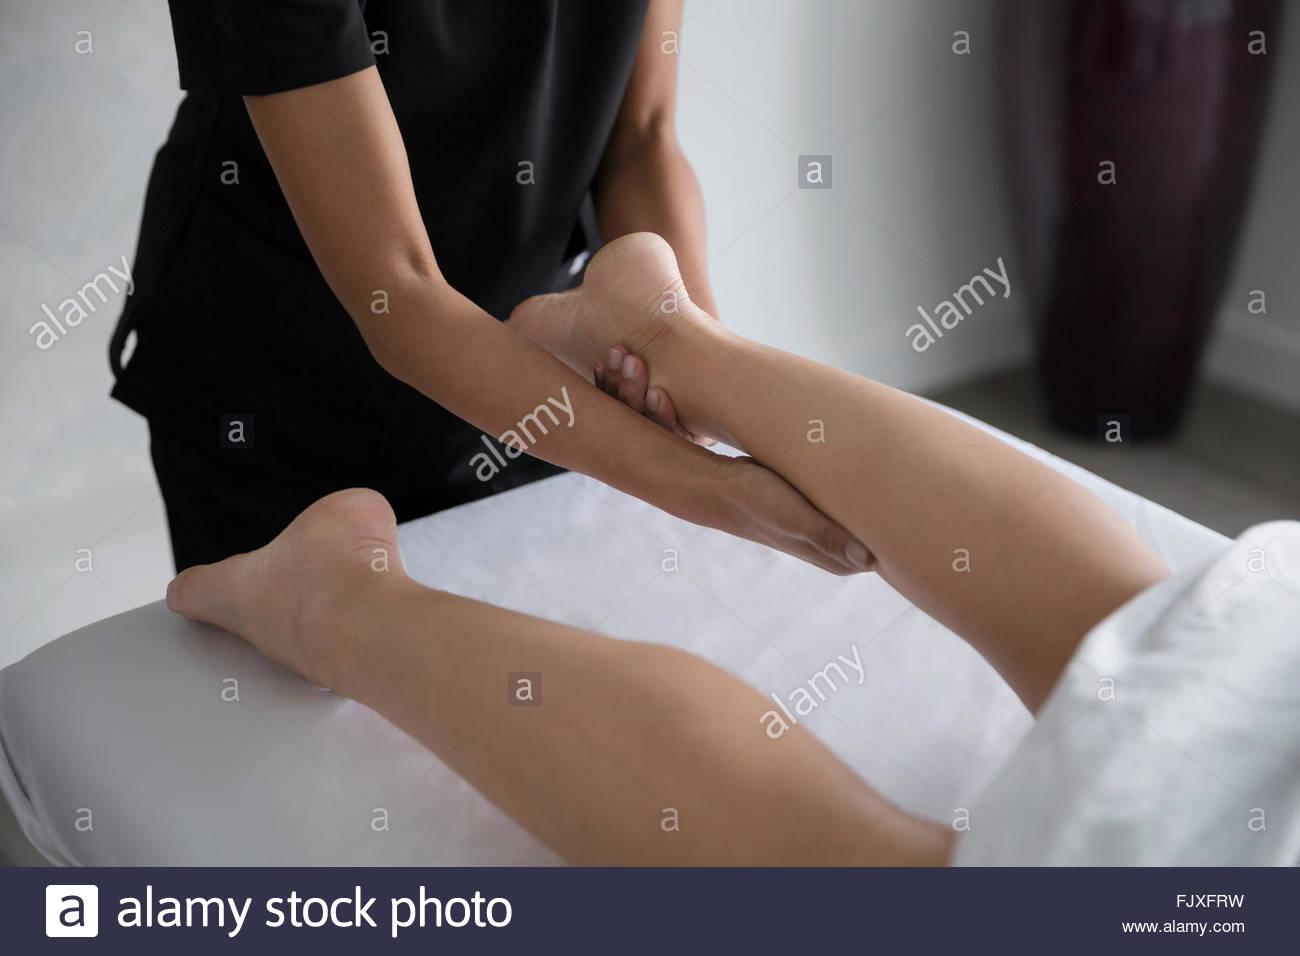 Woman receiving leg massage - Stock Image